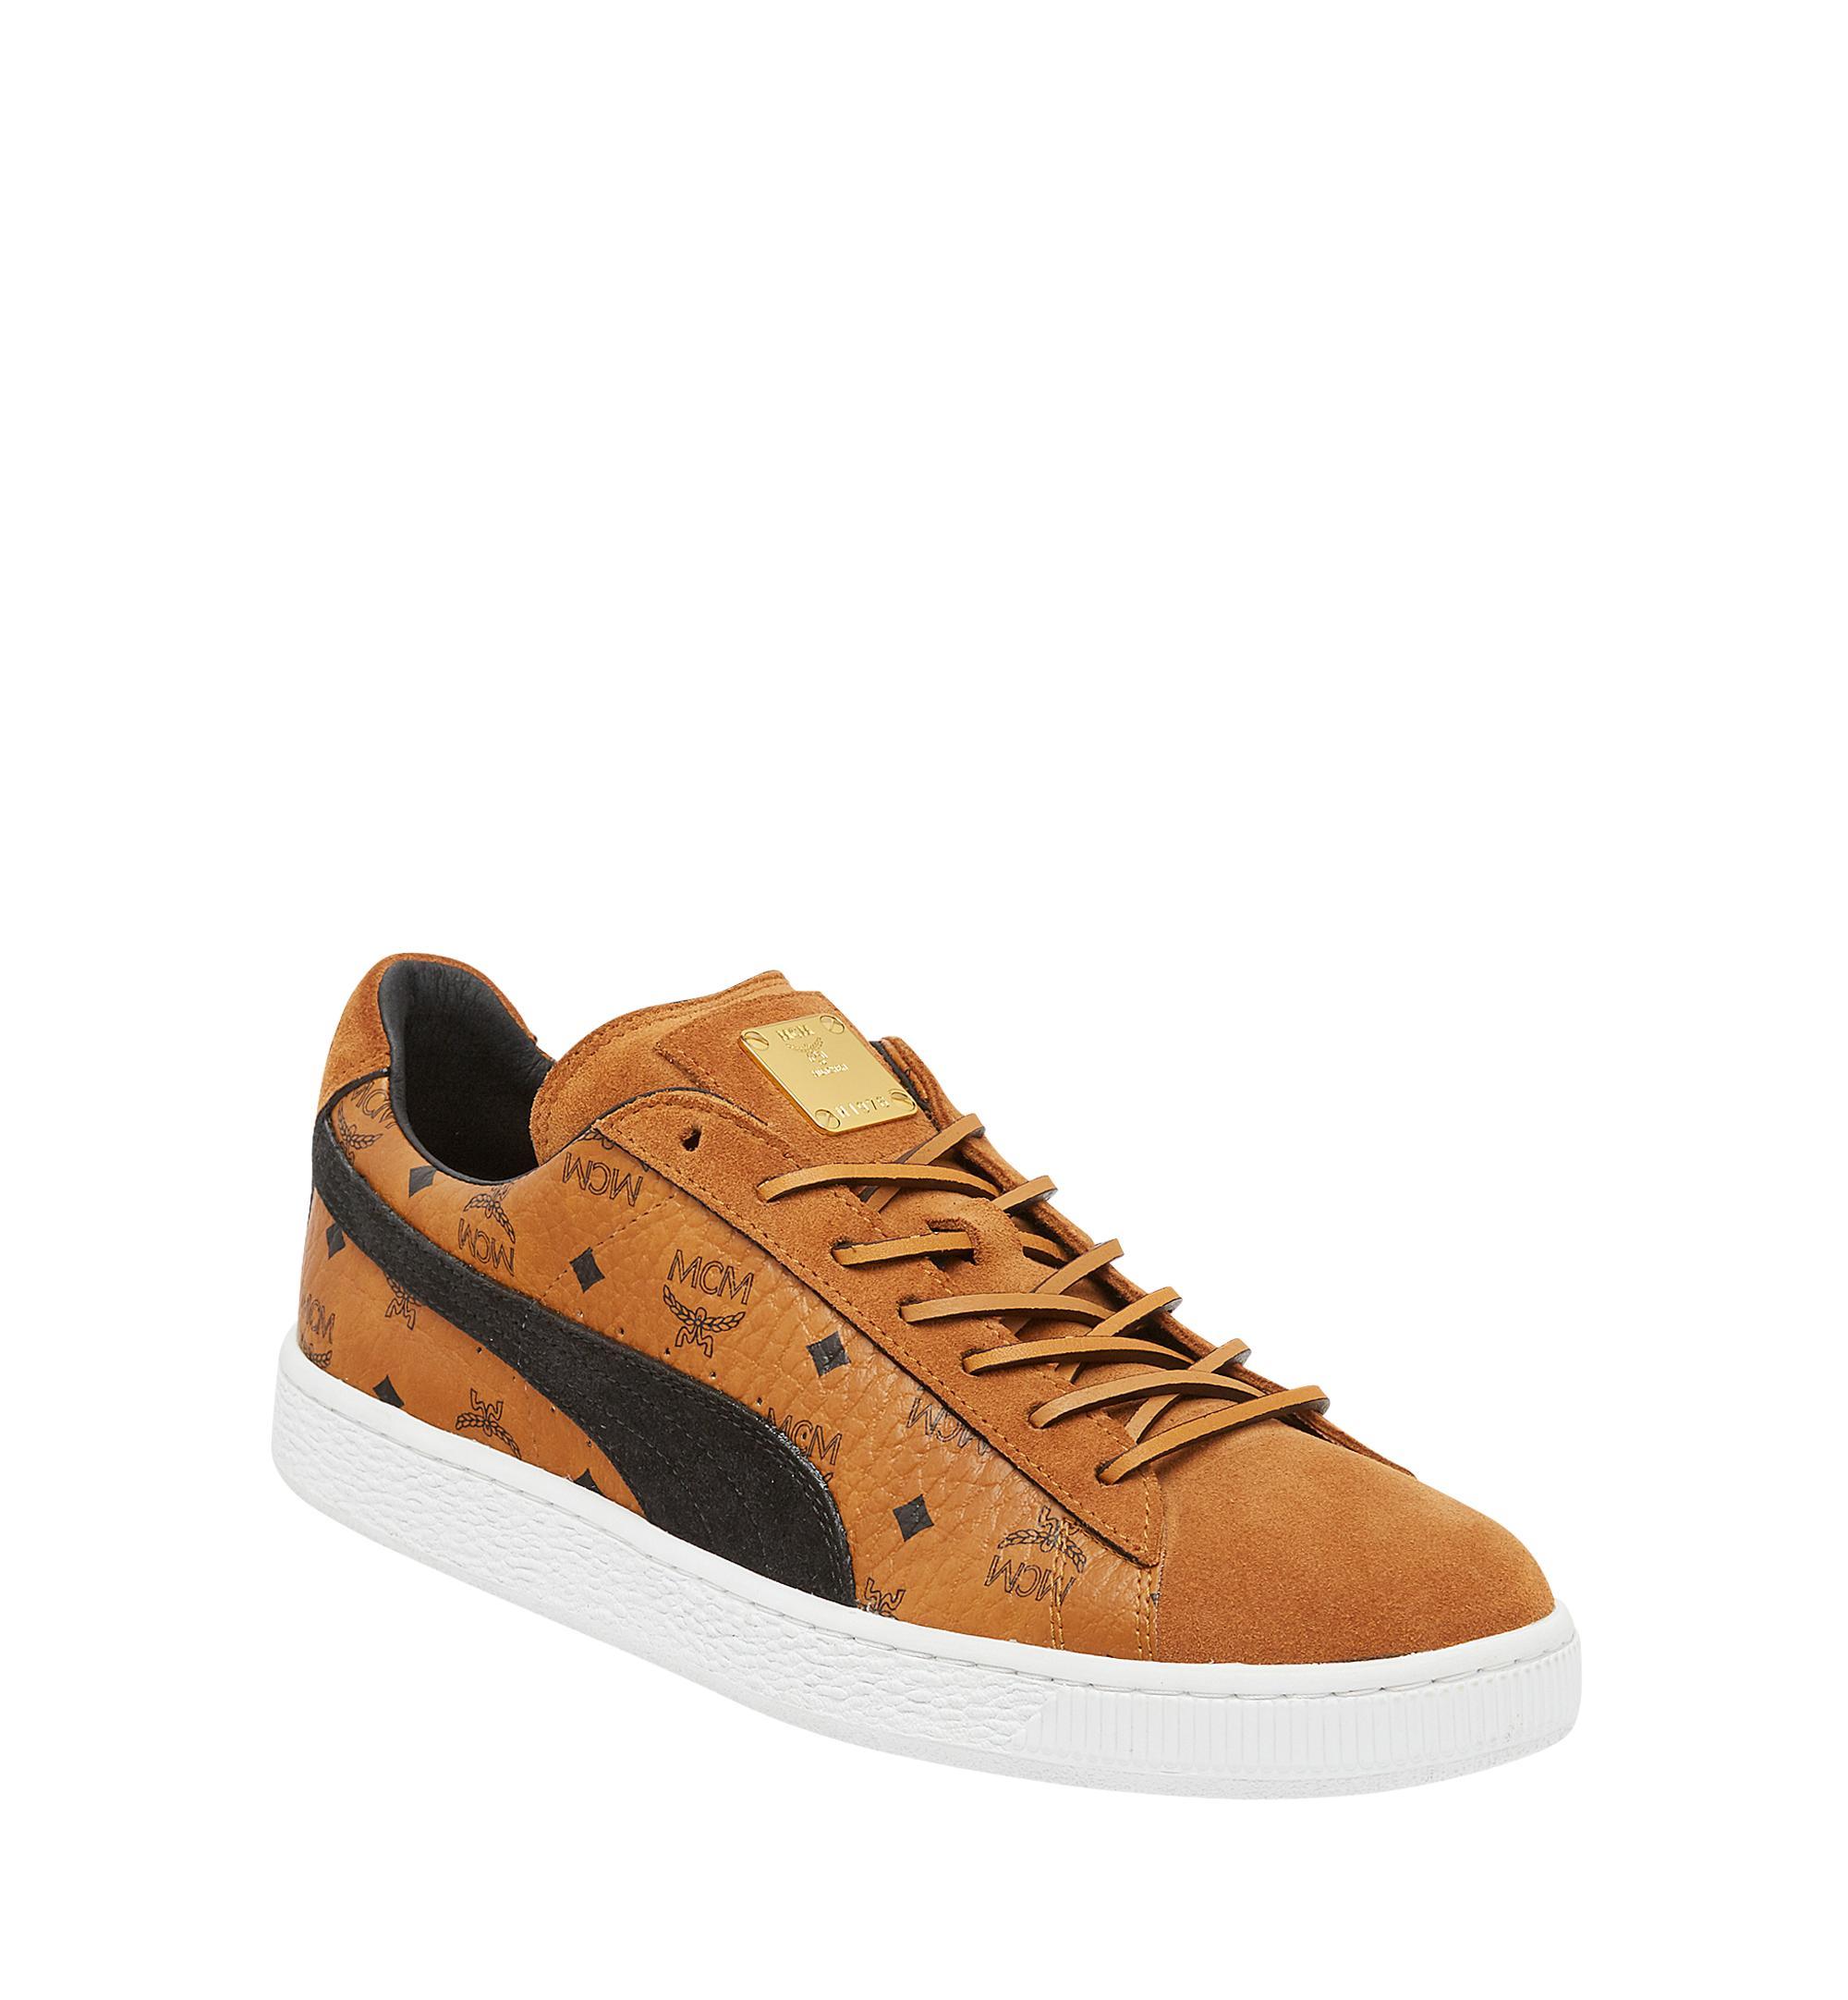 MCM Puma X Suede Classic Sneakers in Cognac (Brown) Lyst